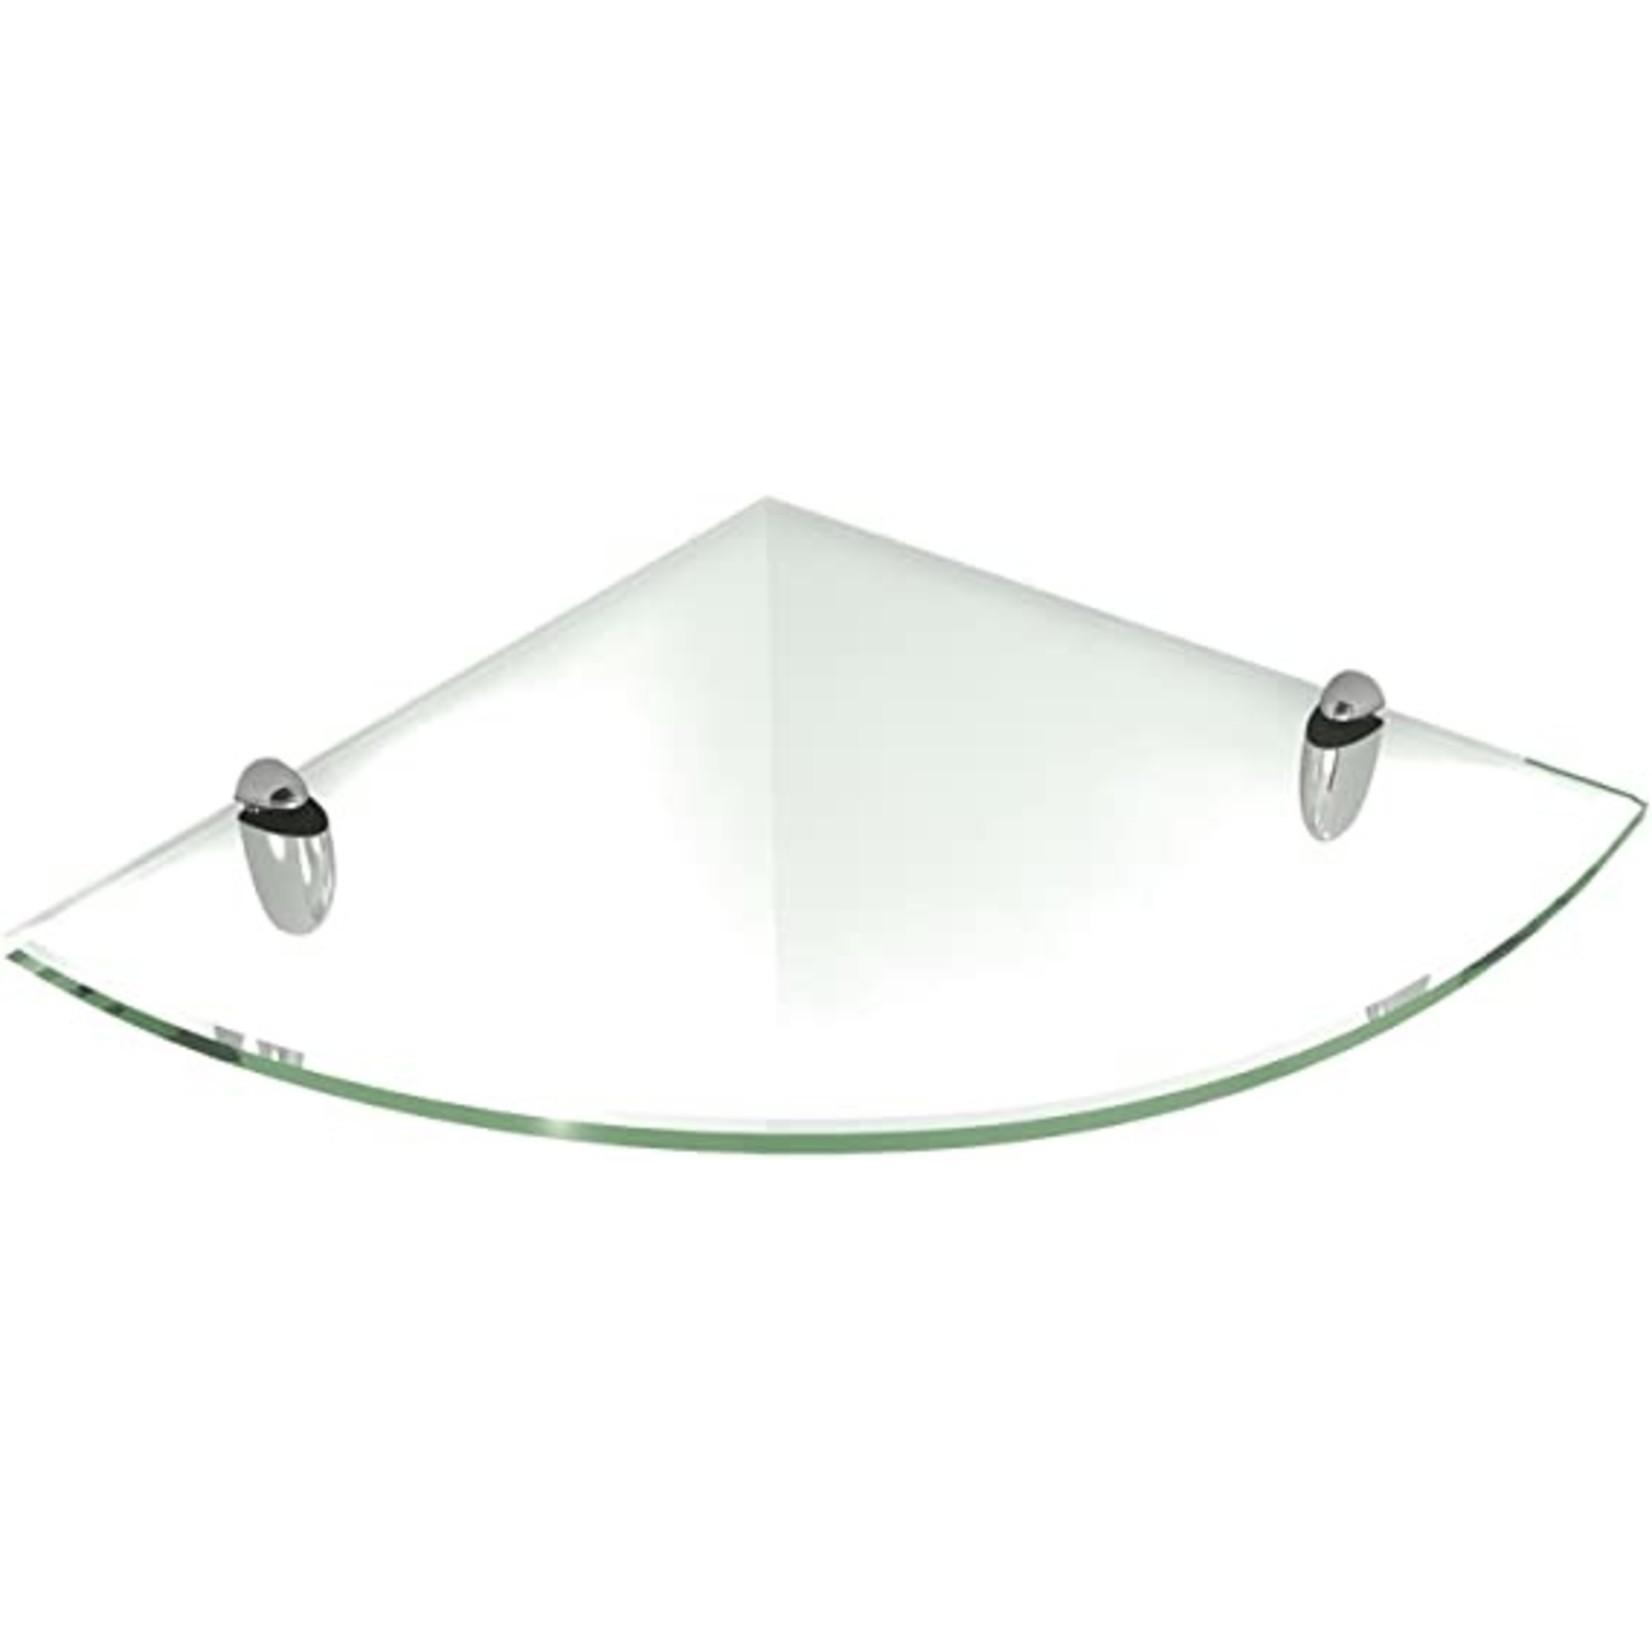 Fritts Floating Glass Wall Shelf - Brass Brackets (Final Sale)